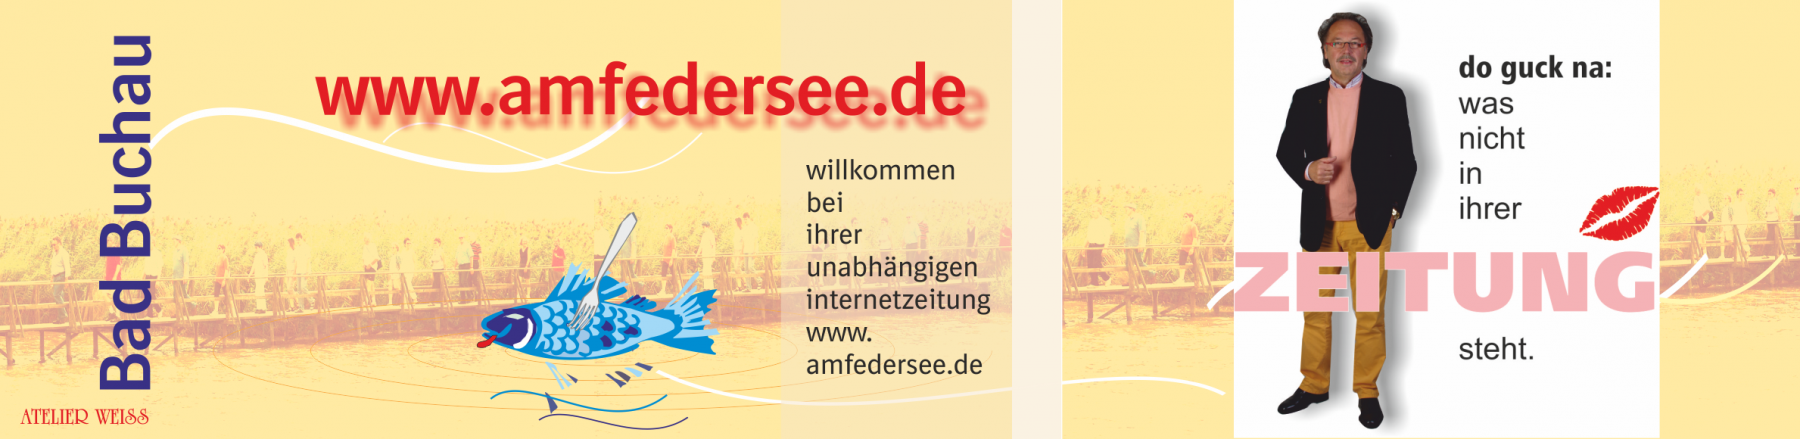 AmFedersee.de